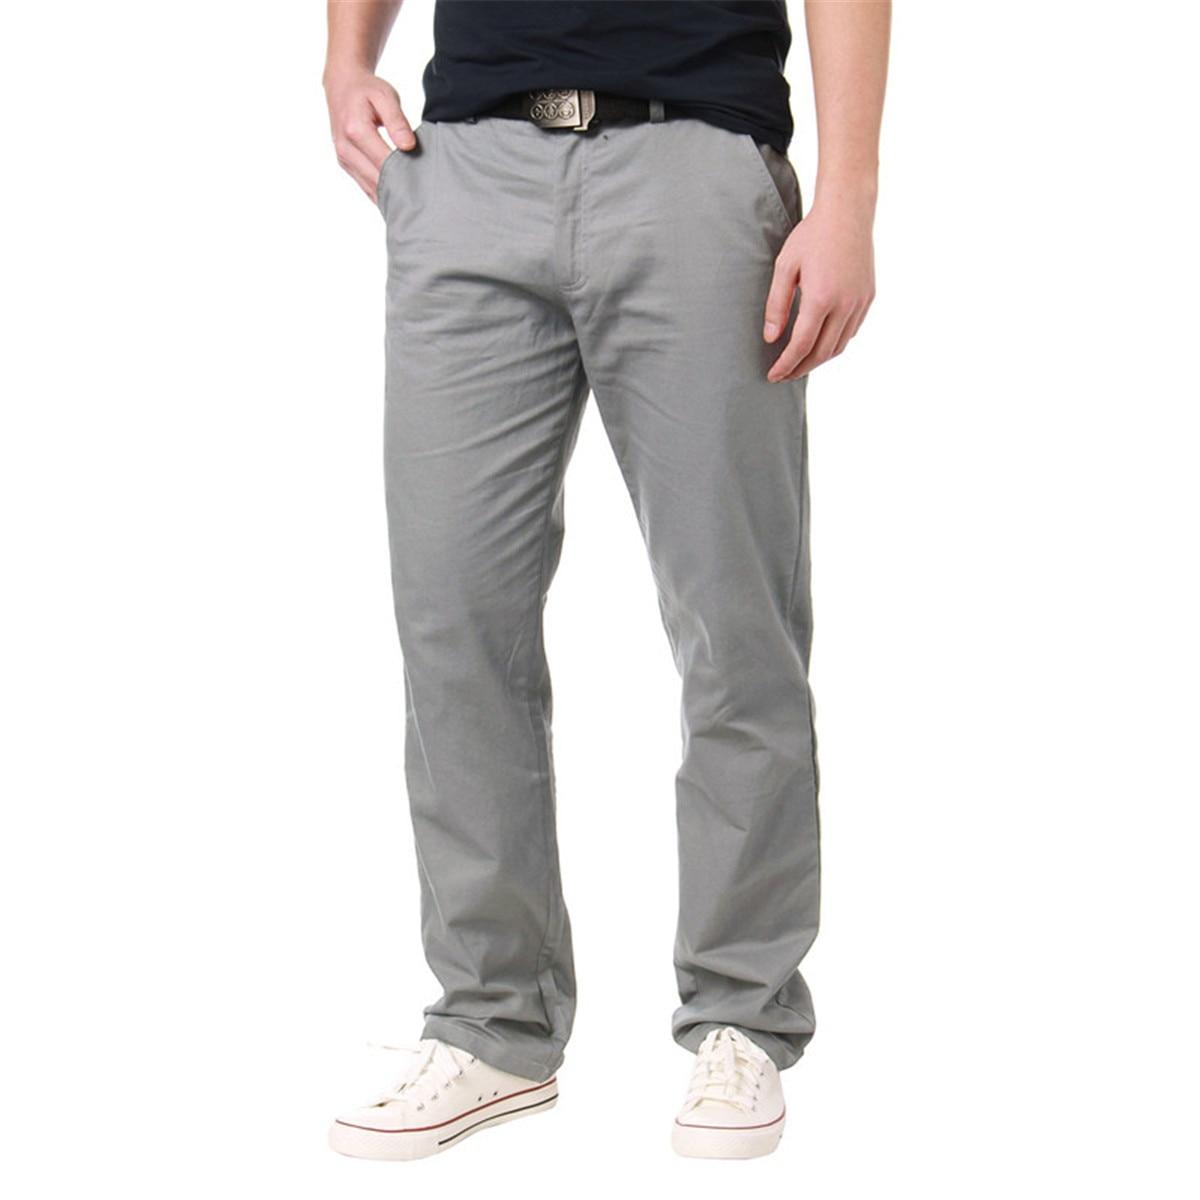 21605d9e426 Detail Feedback Questions about 2018 Men Autumn Spring Pants Fashion Casual  Work Formal Solid Color Zipper Slim Fit Cargo Harem Pants Male Long Trousers  30 ...